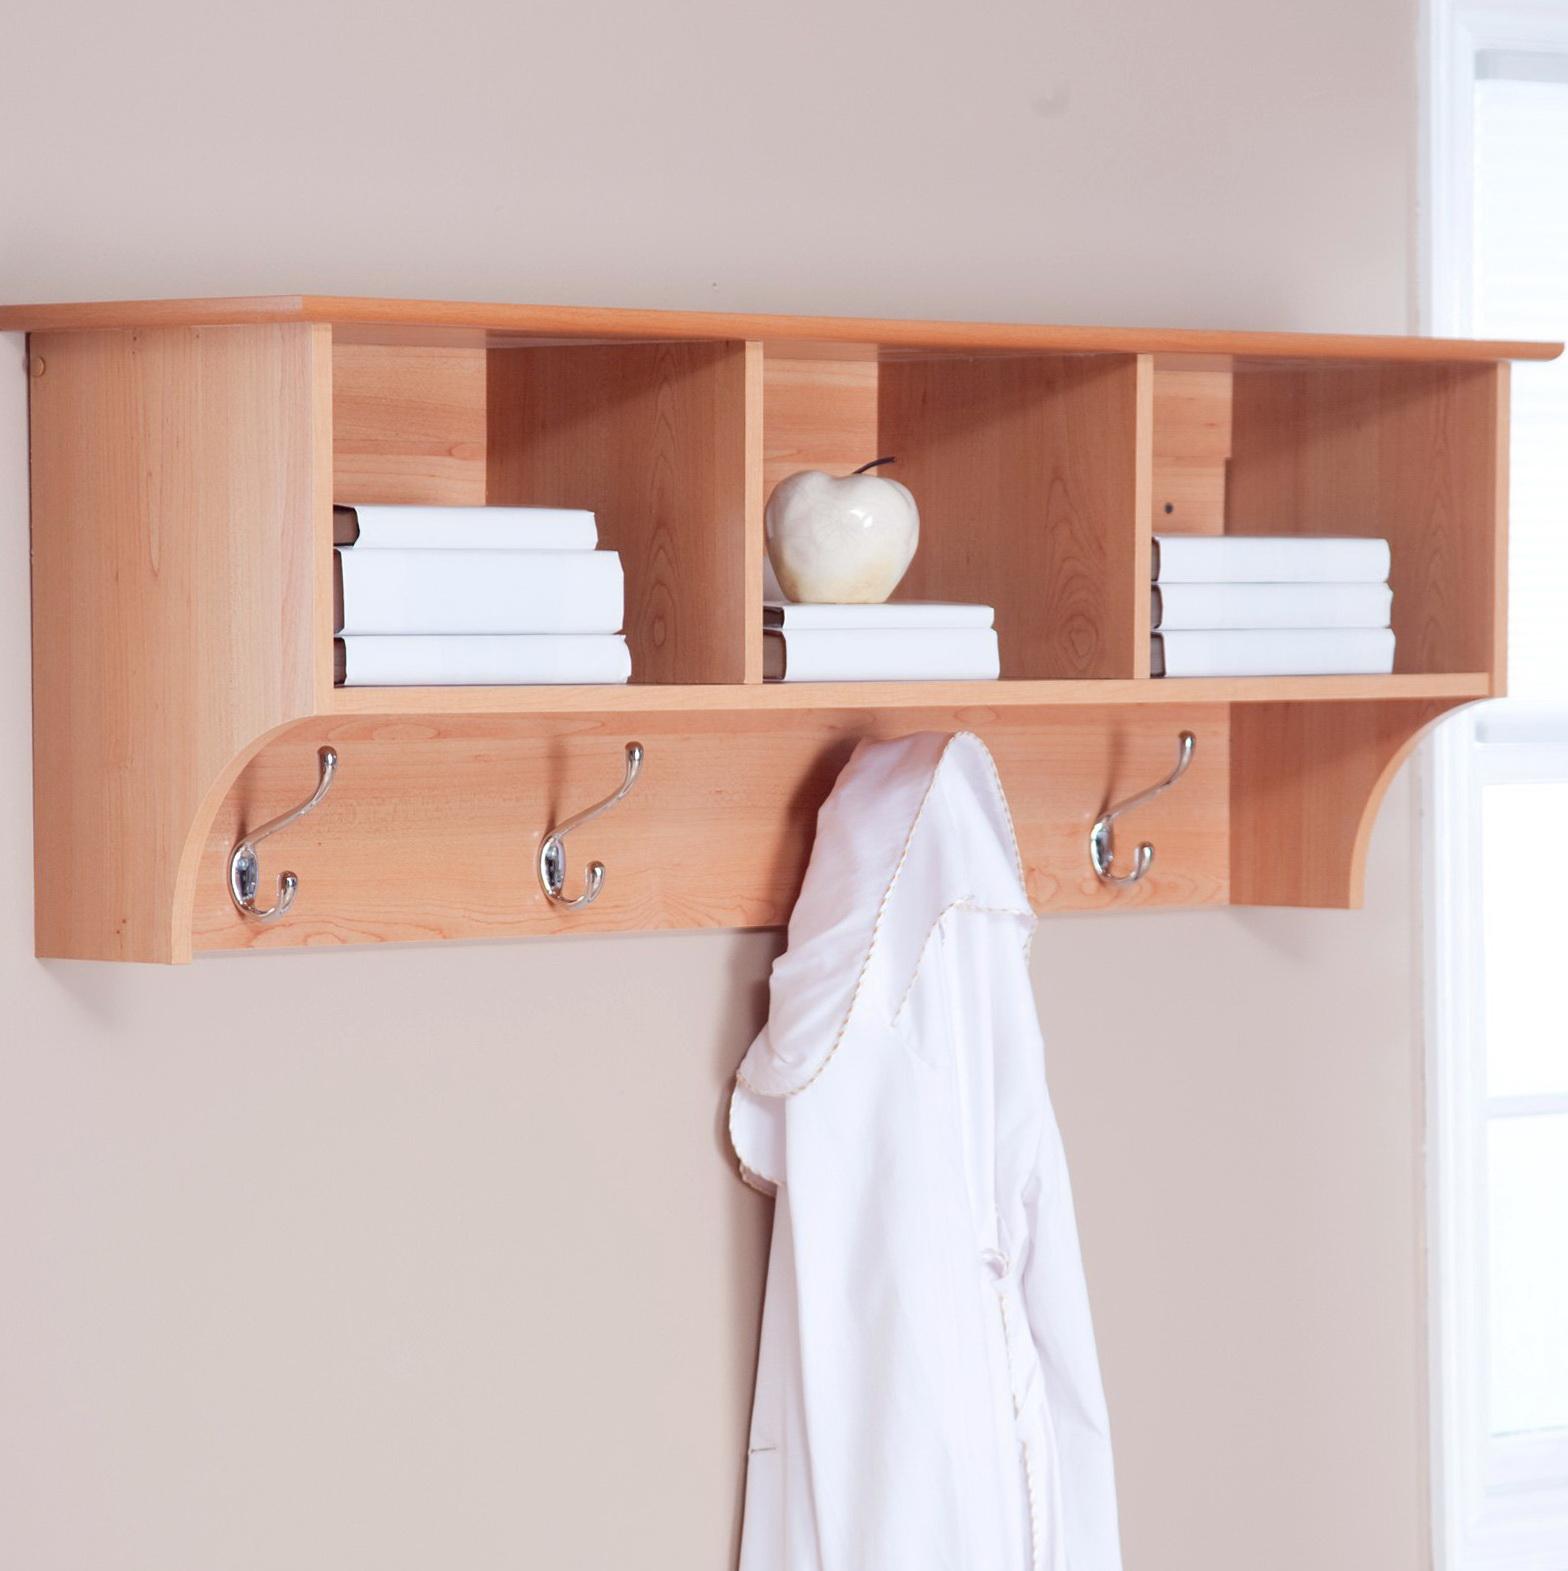 Wooden Wall Mounted Coat Rack With Shelf